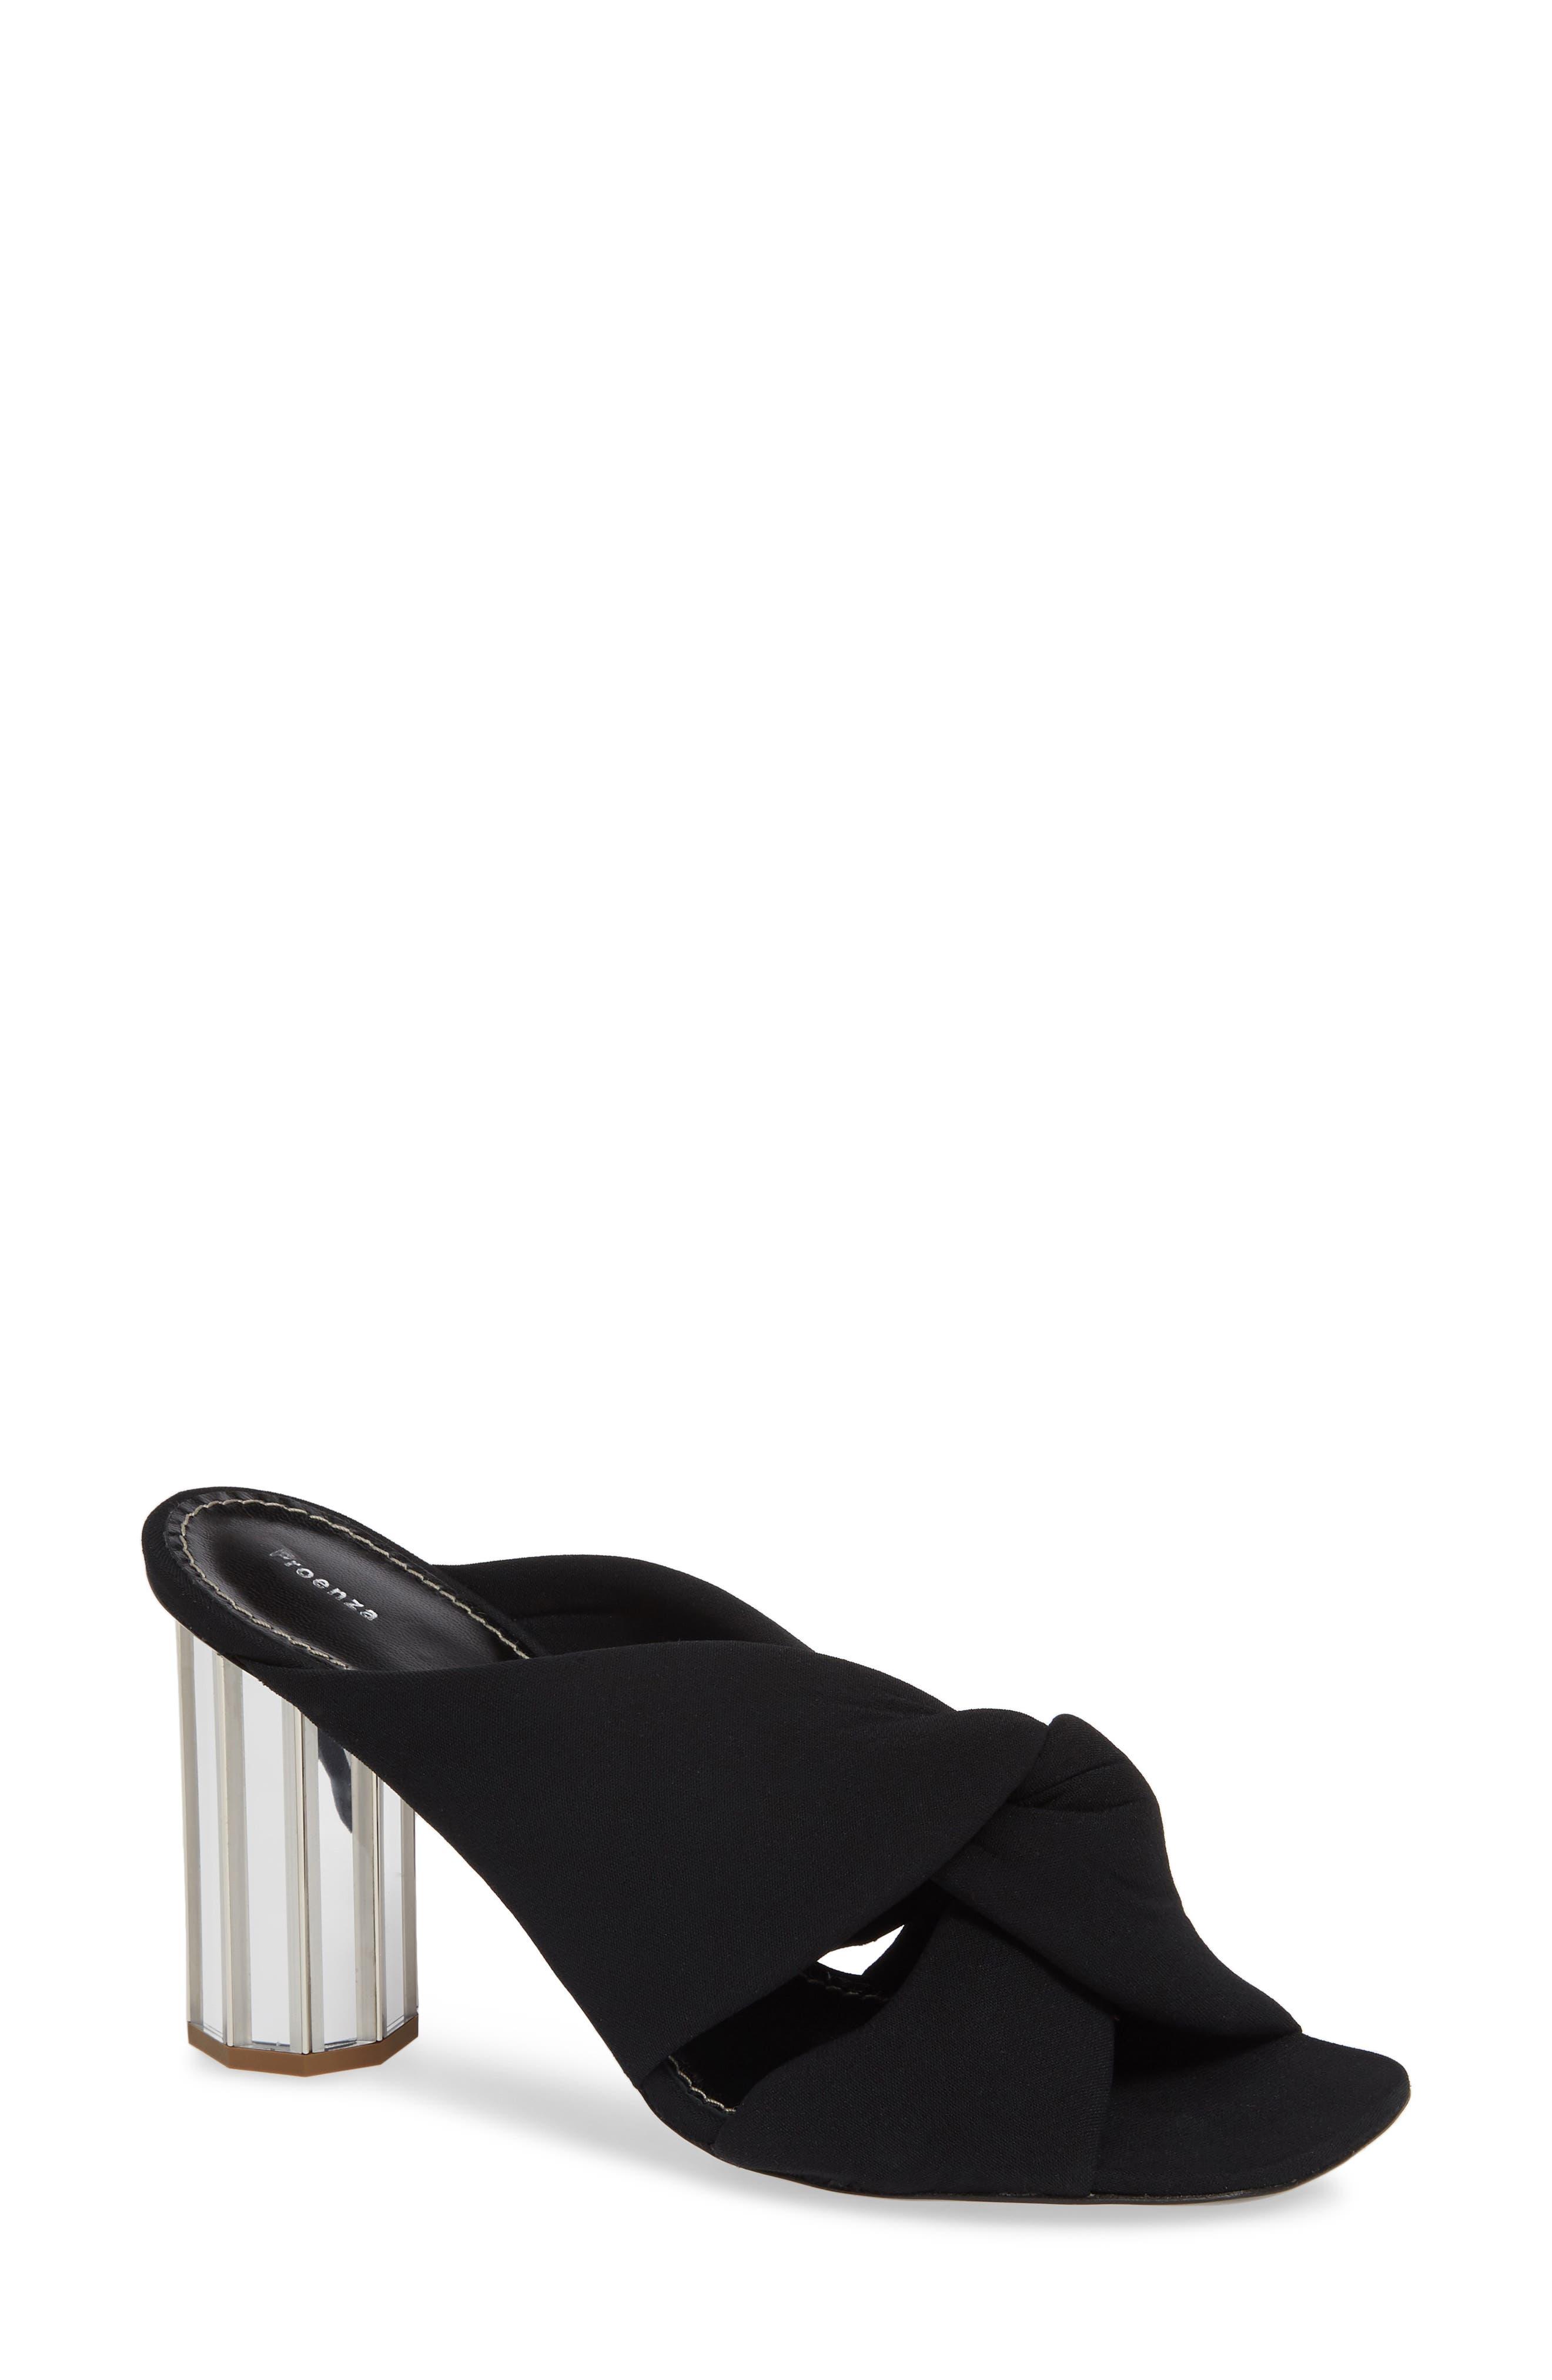 PROENZA SCHOULER, Knotted Slide Sandal, Main thumbnail 1, color, BLACK